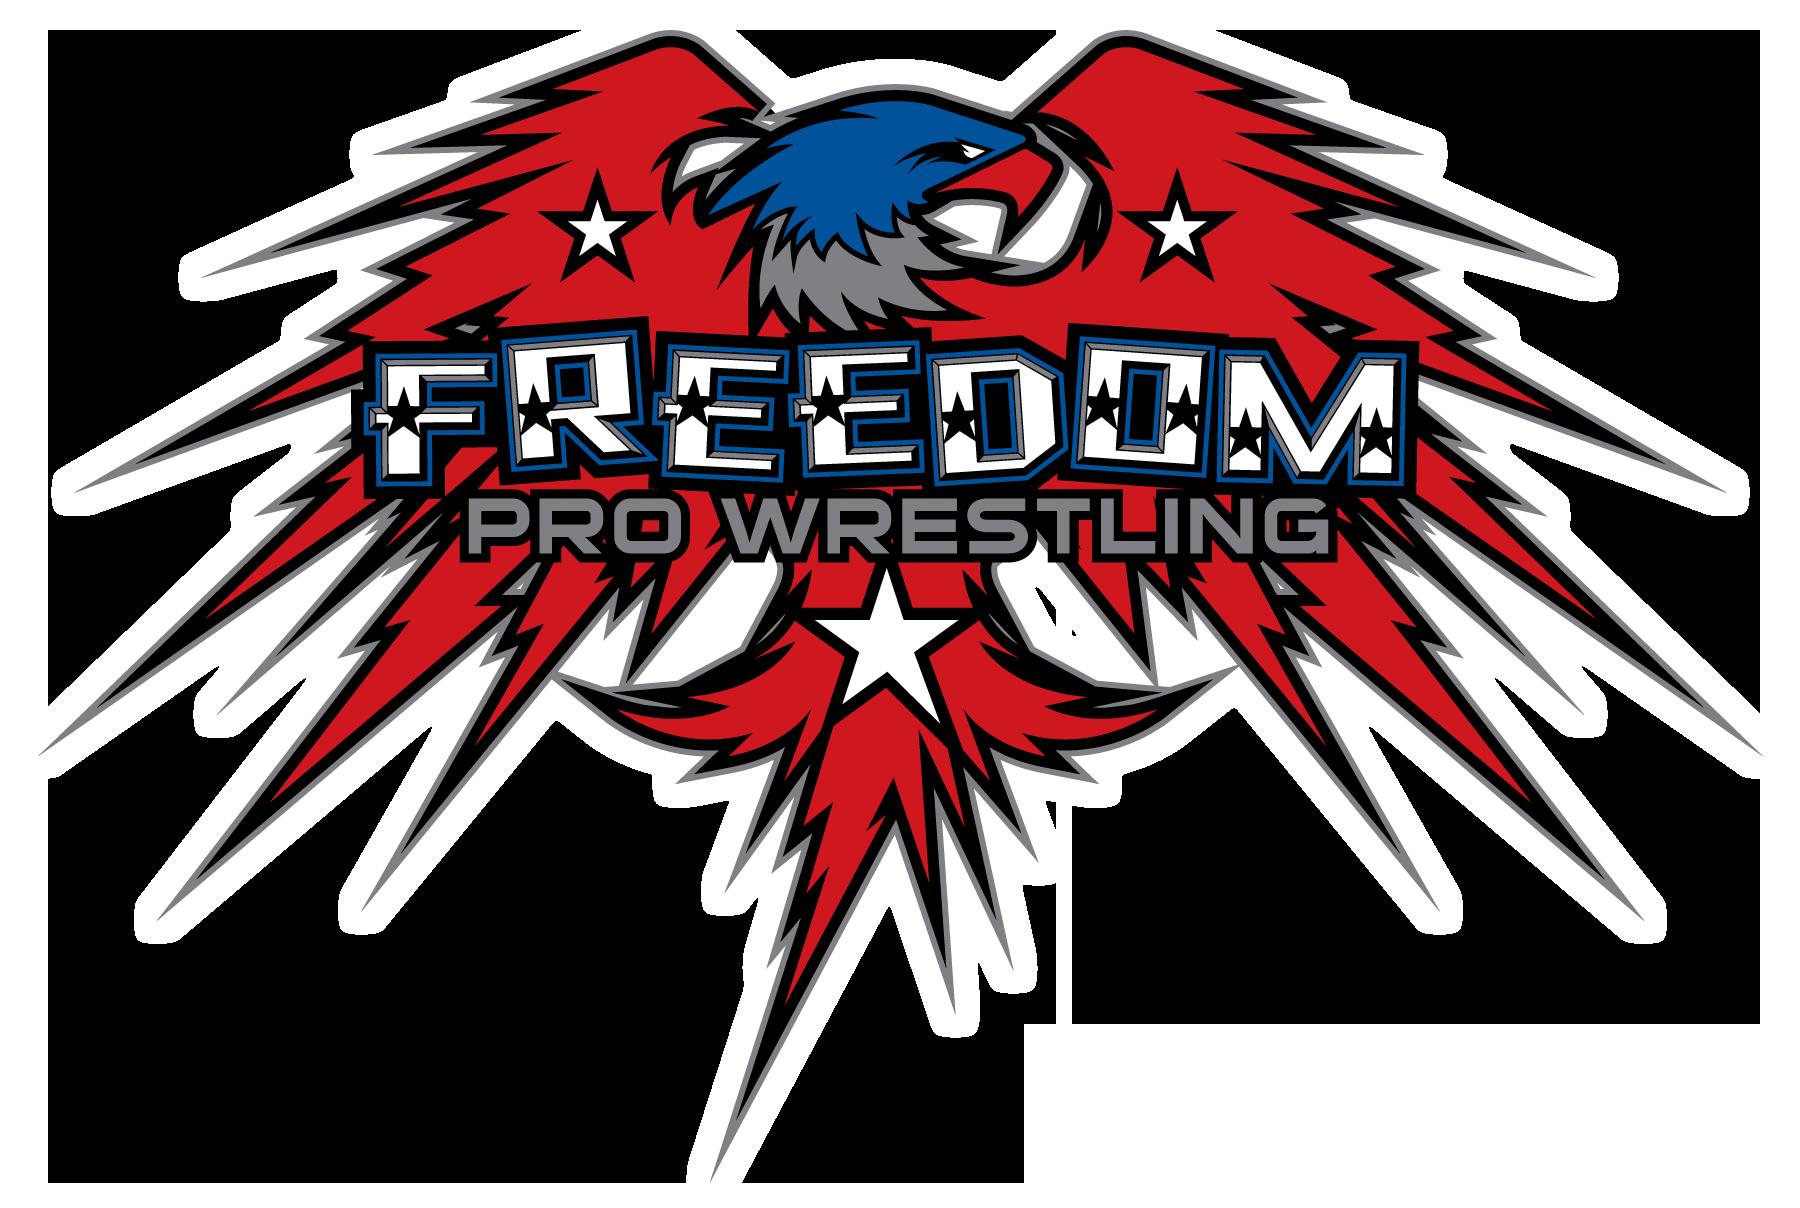 Wrestlers clipart pro wrestler. Freedom wrestling the buzz